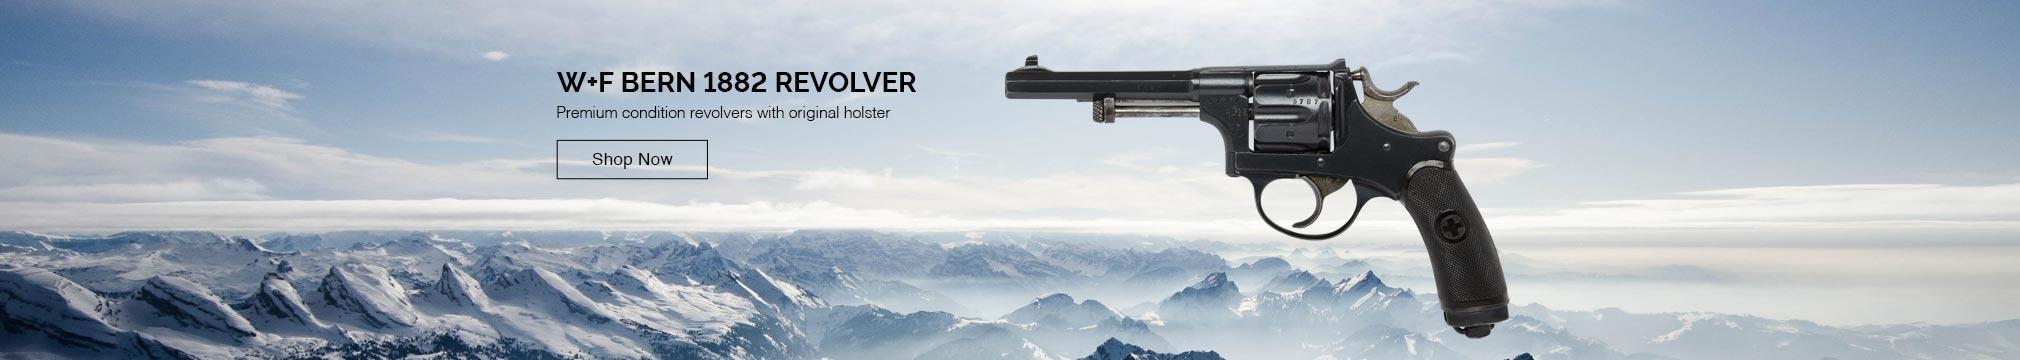 swiss revolvers back in stock